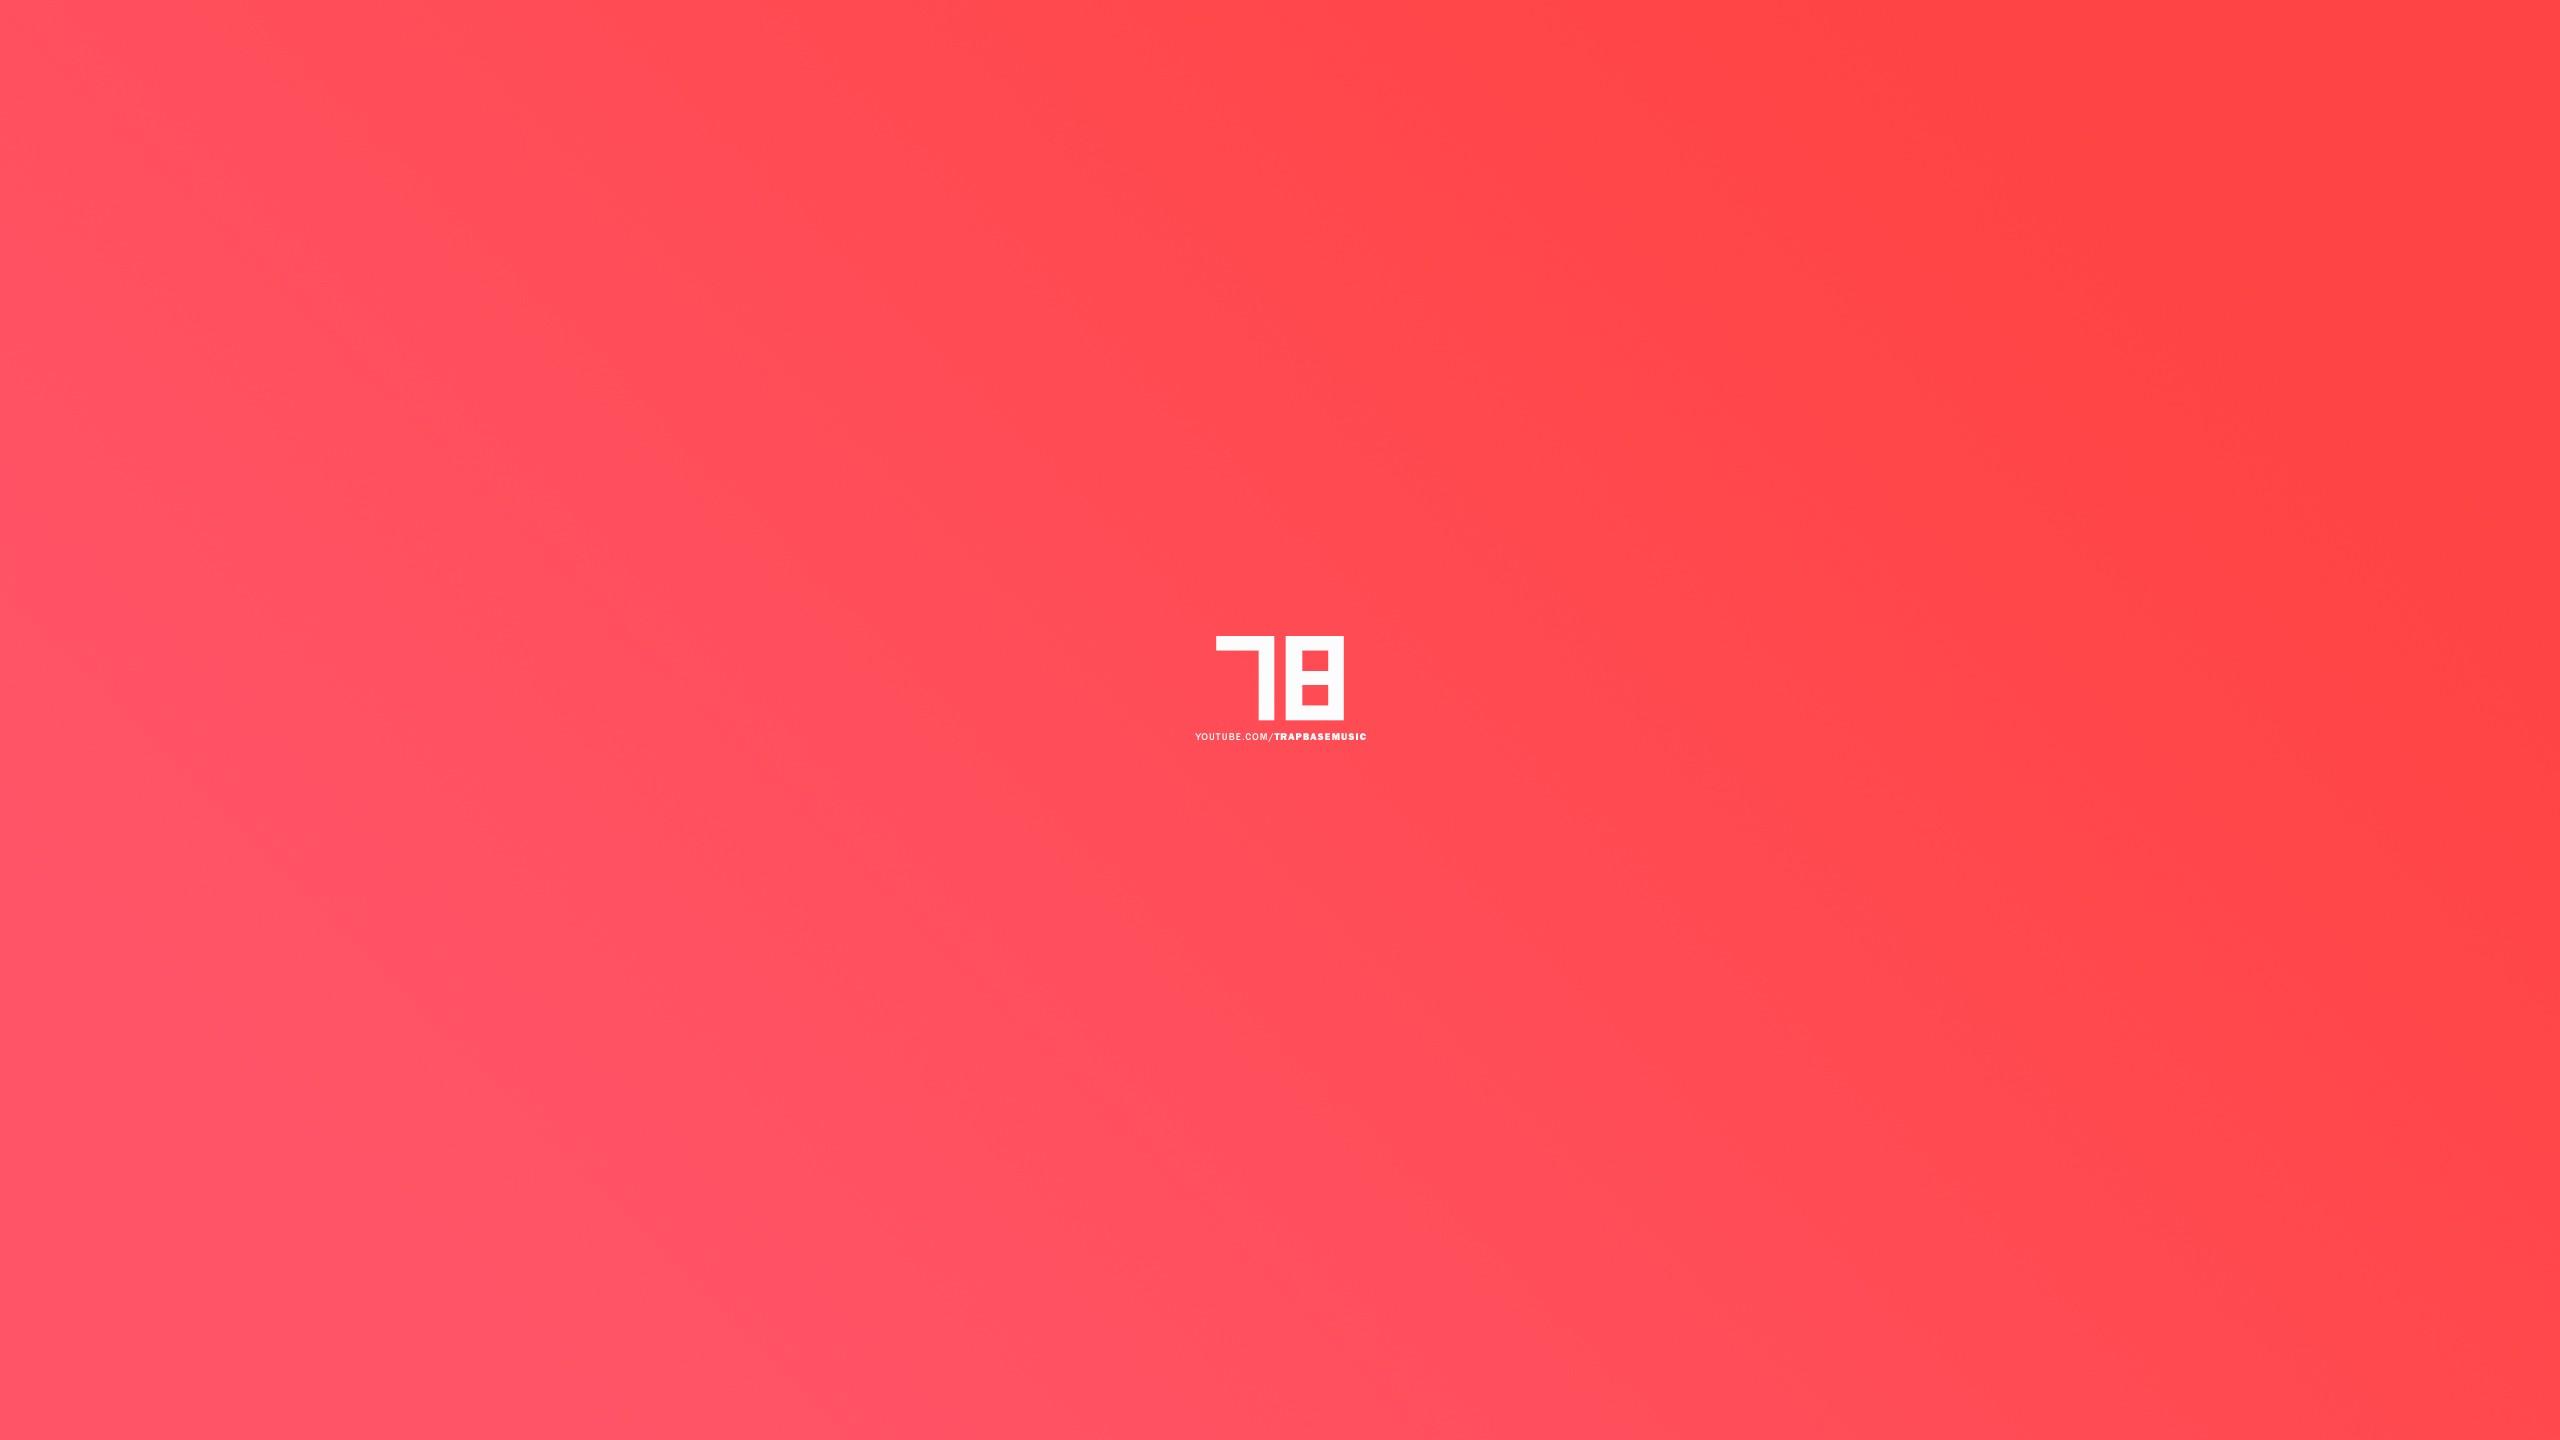 Masaüstü Renkli Basit Arka Plan Minimalizm Kırmızı Metin